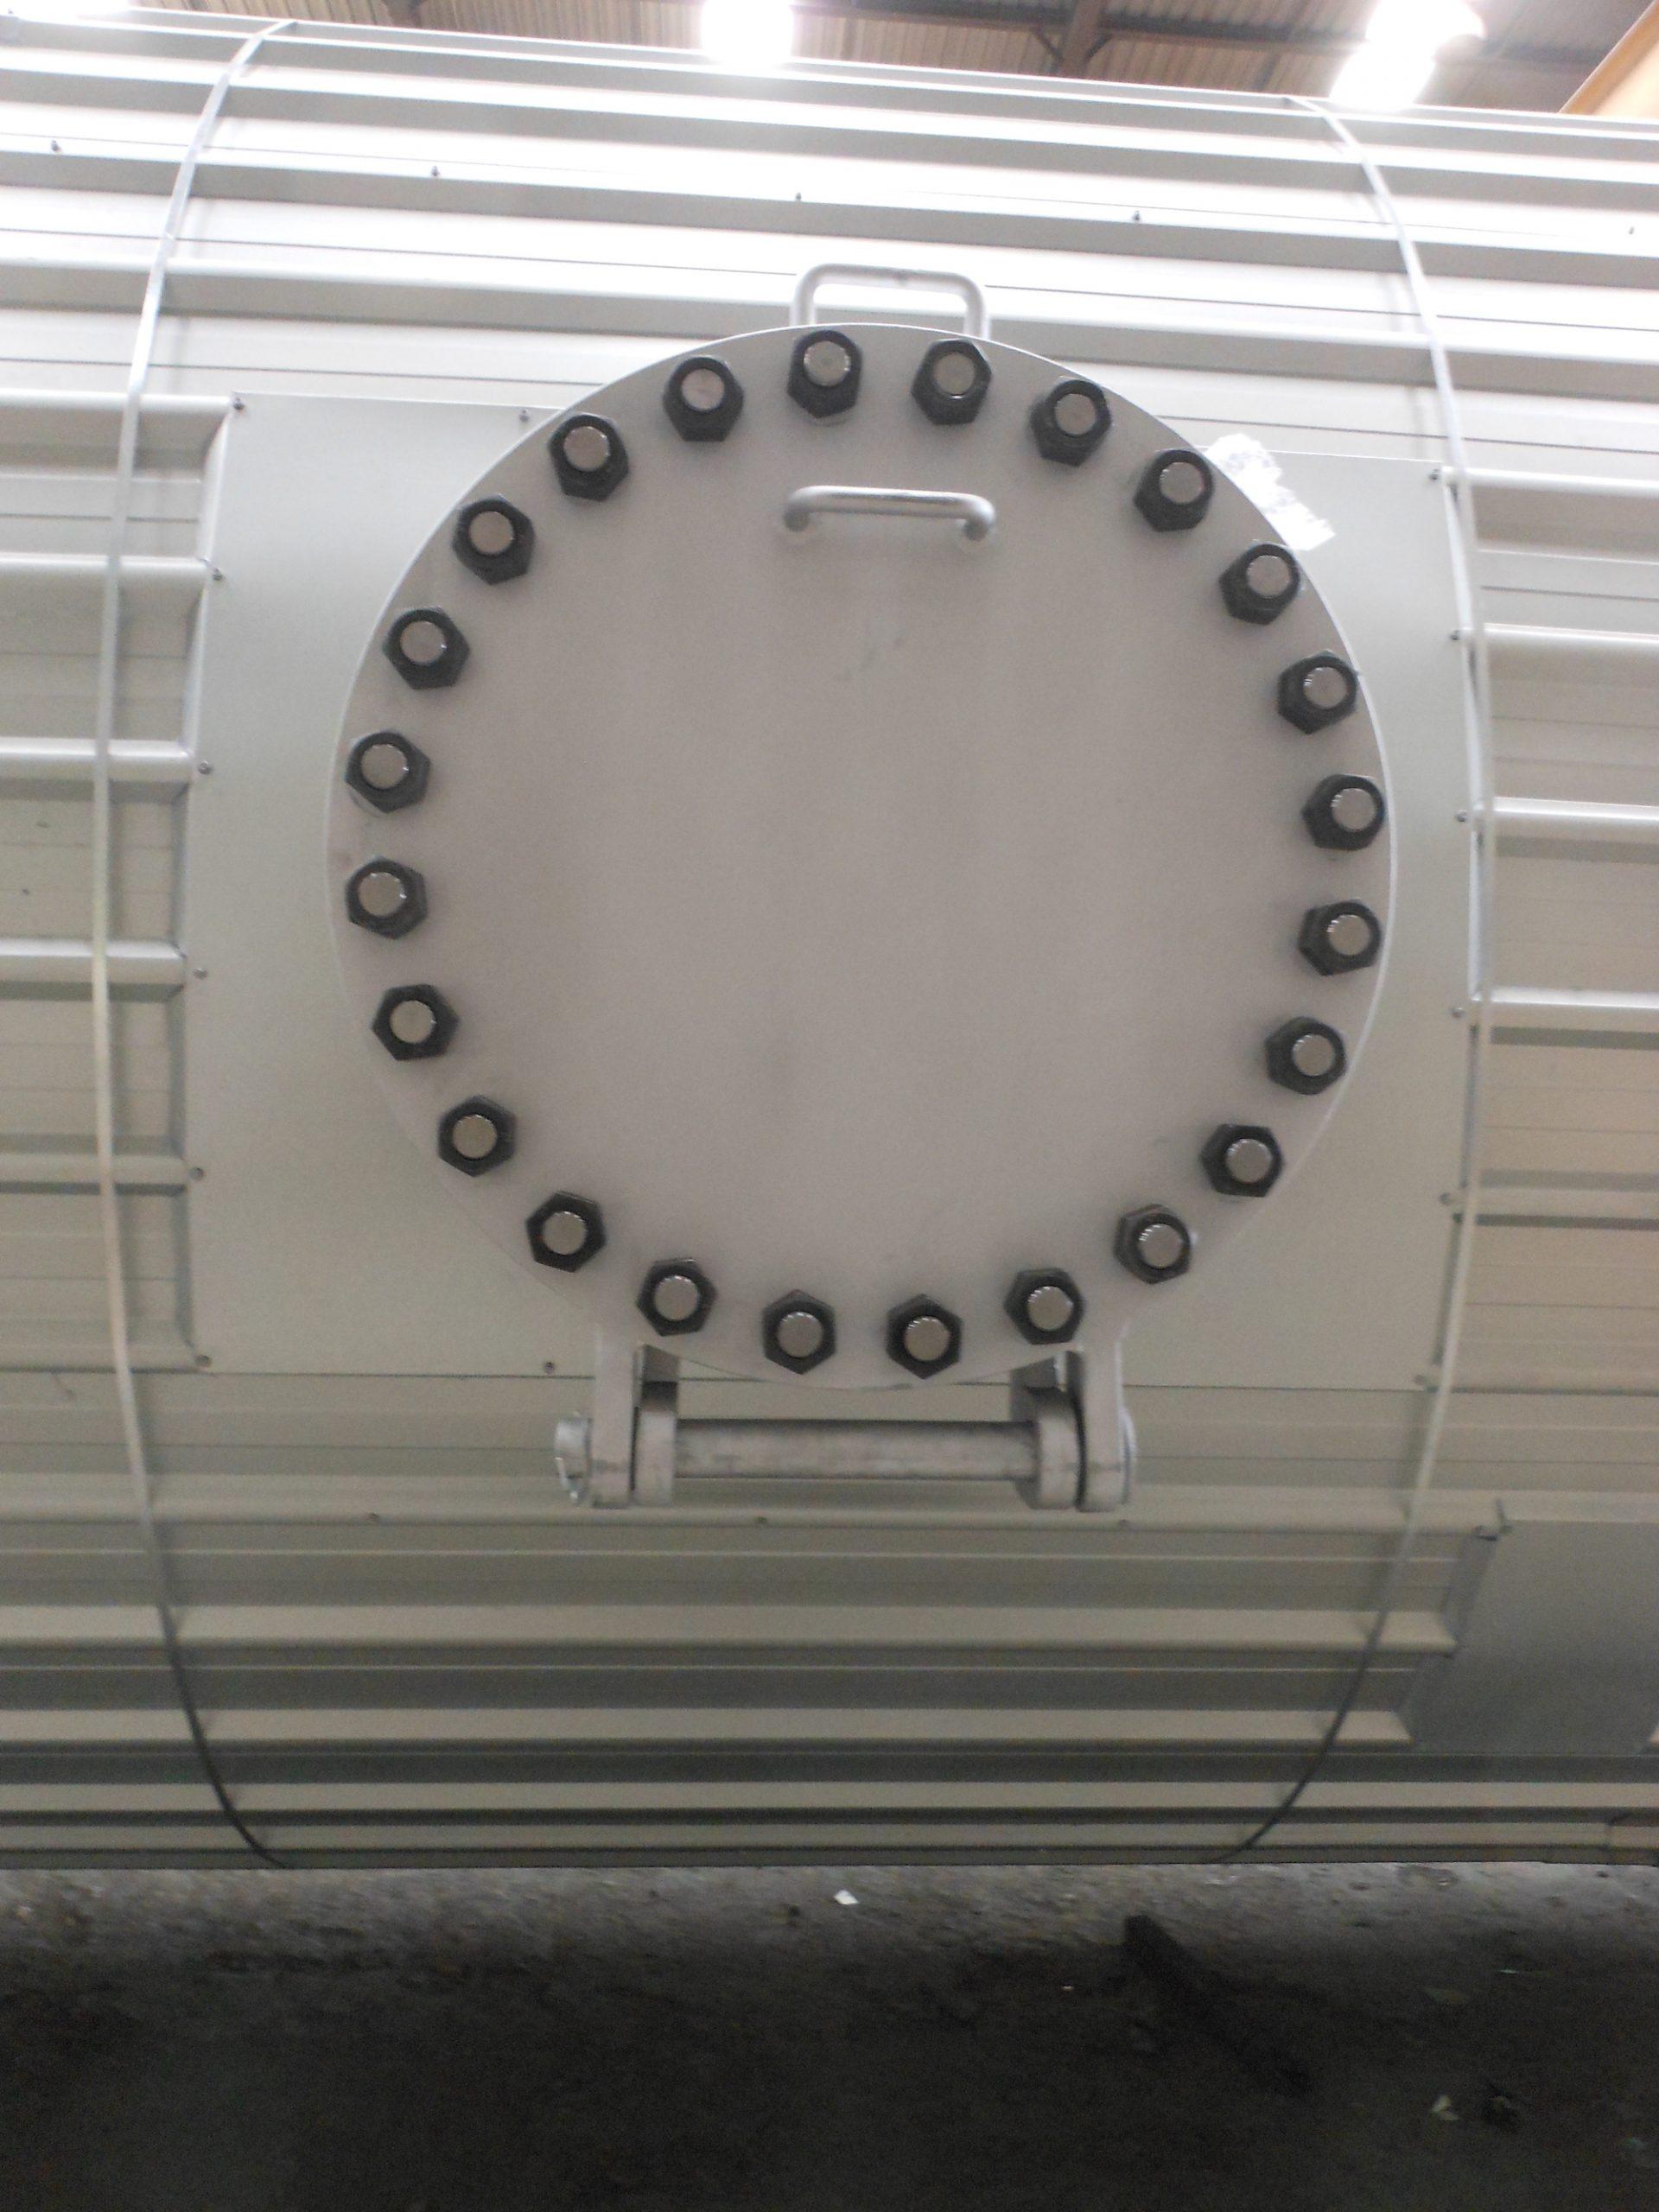 LA3130 - Caltex, Vessel - Manway bolted _ insulation (2104-02-06)